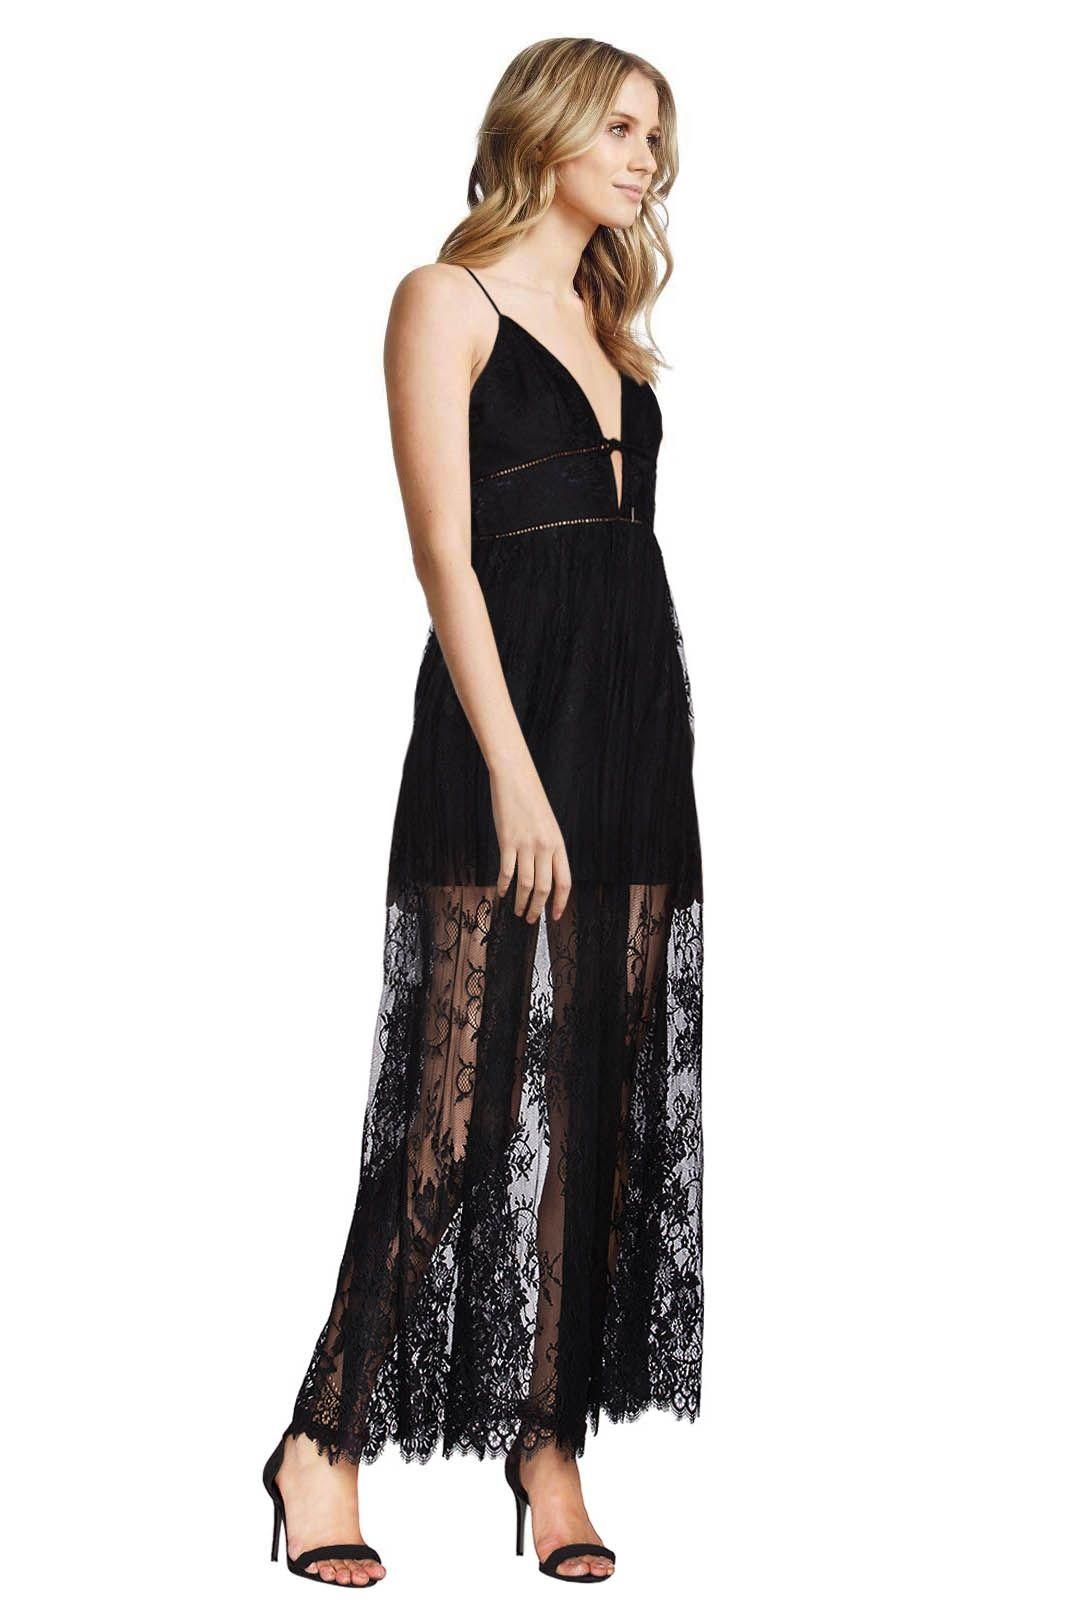 X by NBD - Stella Dress - Black - Side